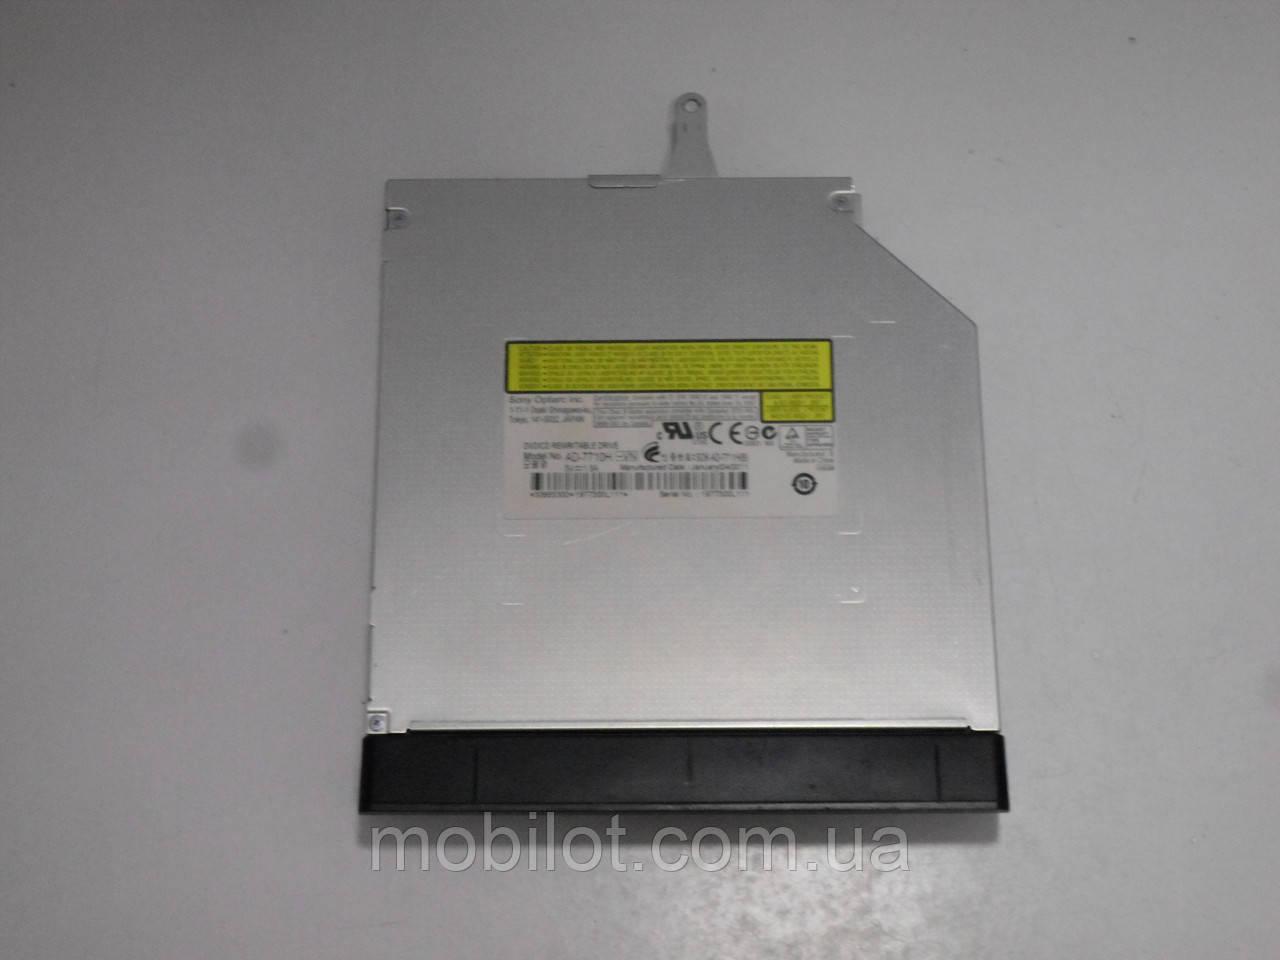 Оптический привод Sony VPCEB4J1R (NZ-7519)